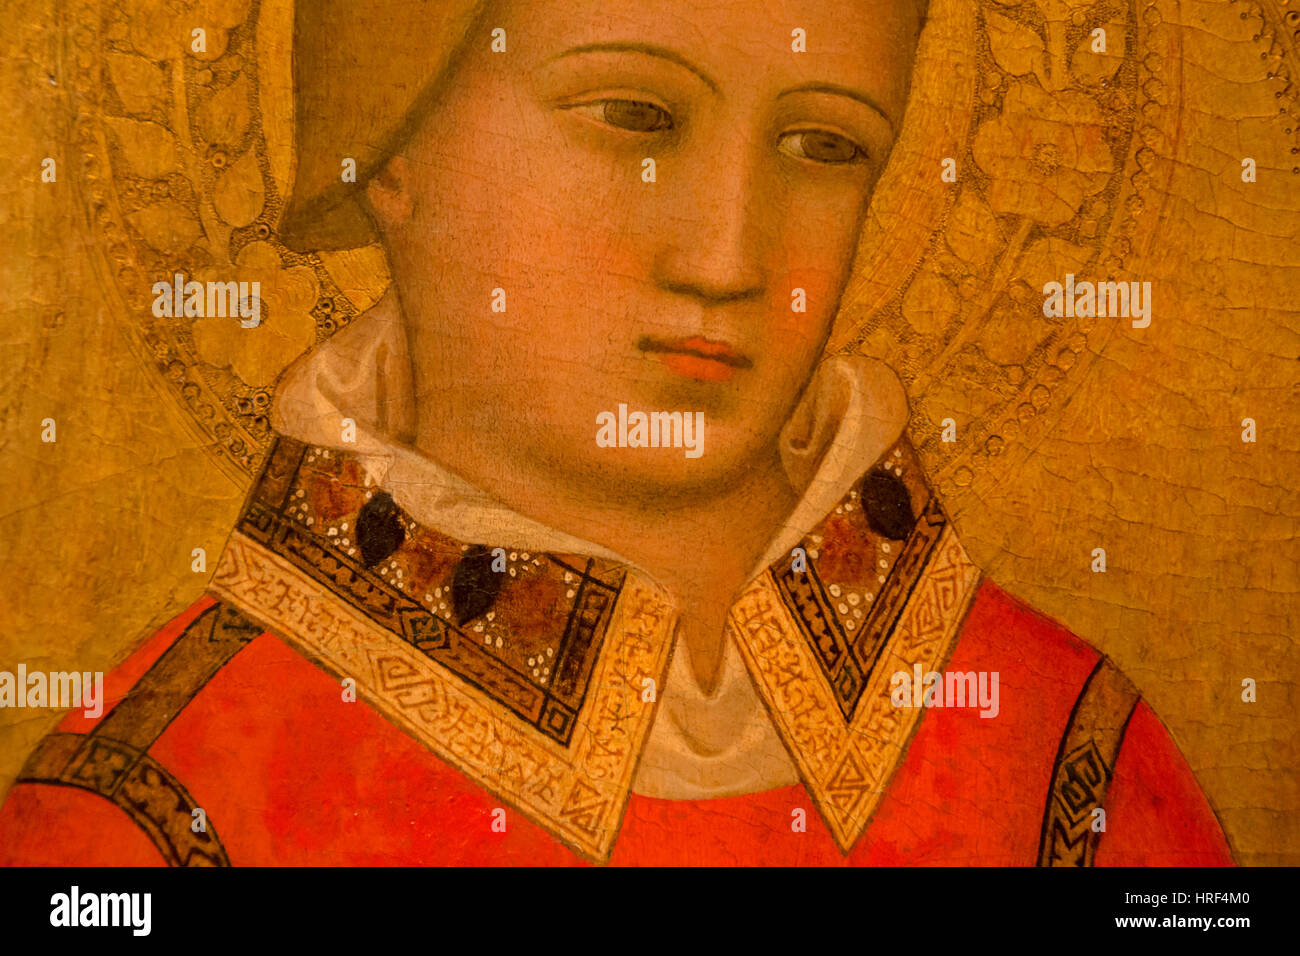 St Stephen, a 14th century portrait by an imitator of the Italian painter Bernardo Daddi at Huis Bergh, s-Heerenberg, - Stock Image